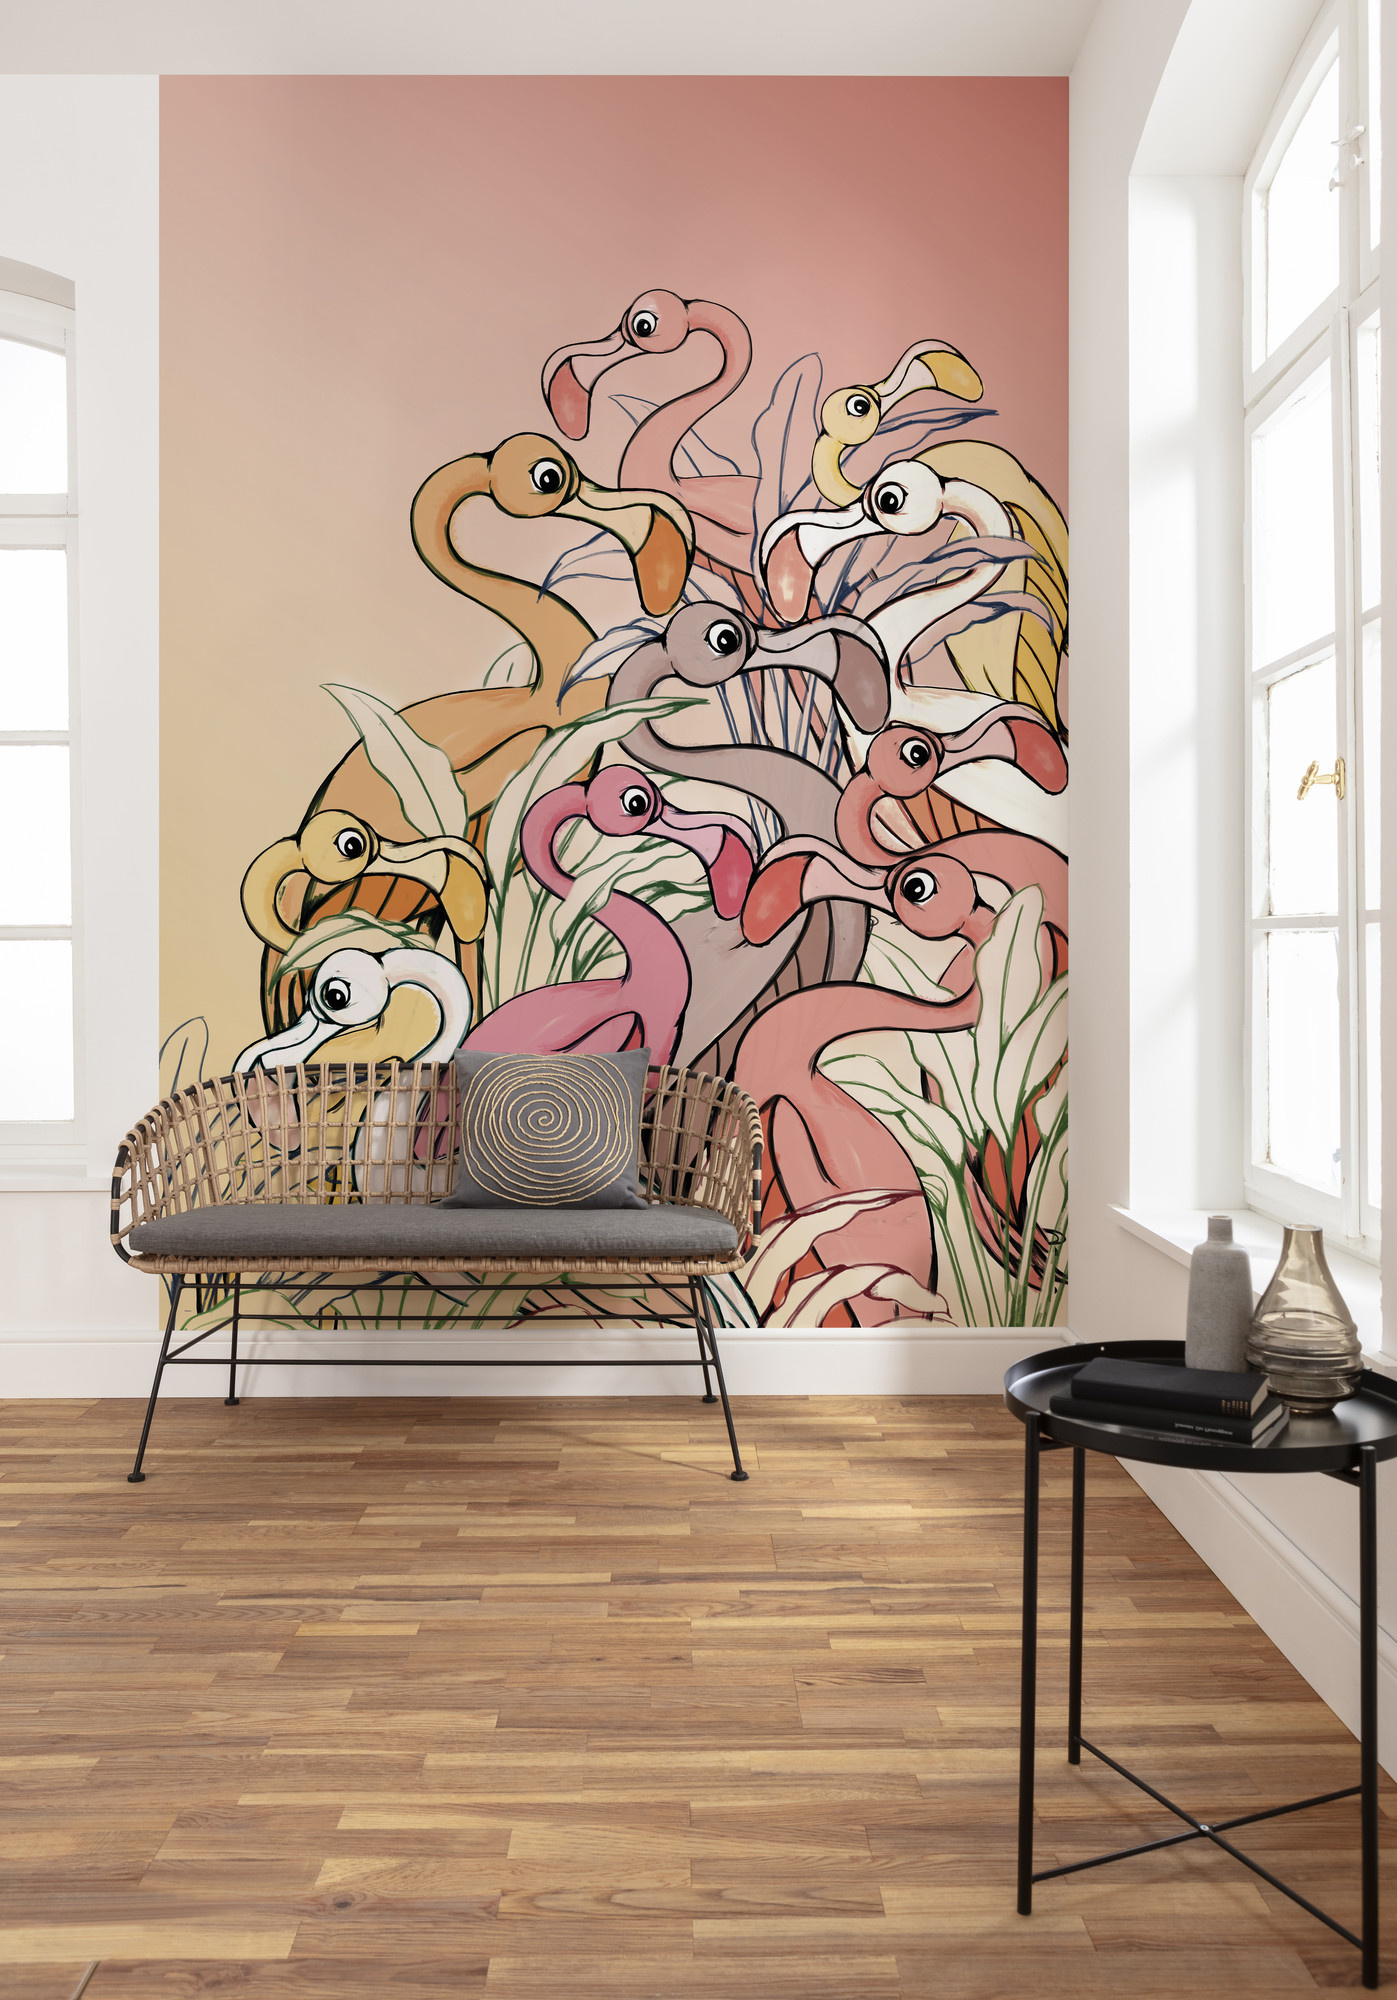 Disney Edition 4 Kinderbehang Komar - Kinderkamer behang Flamingos and Lillys